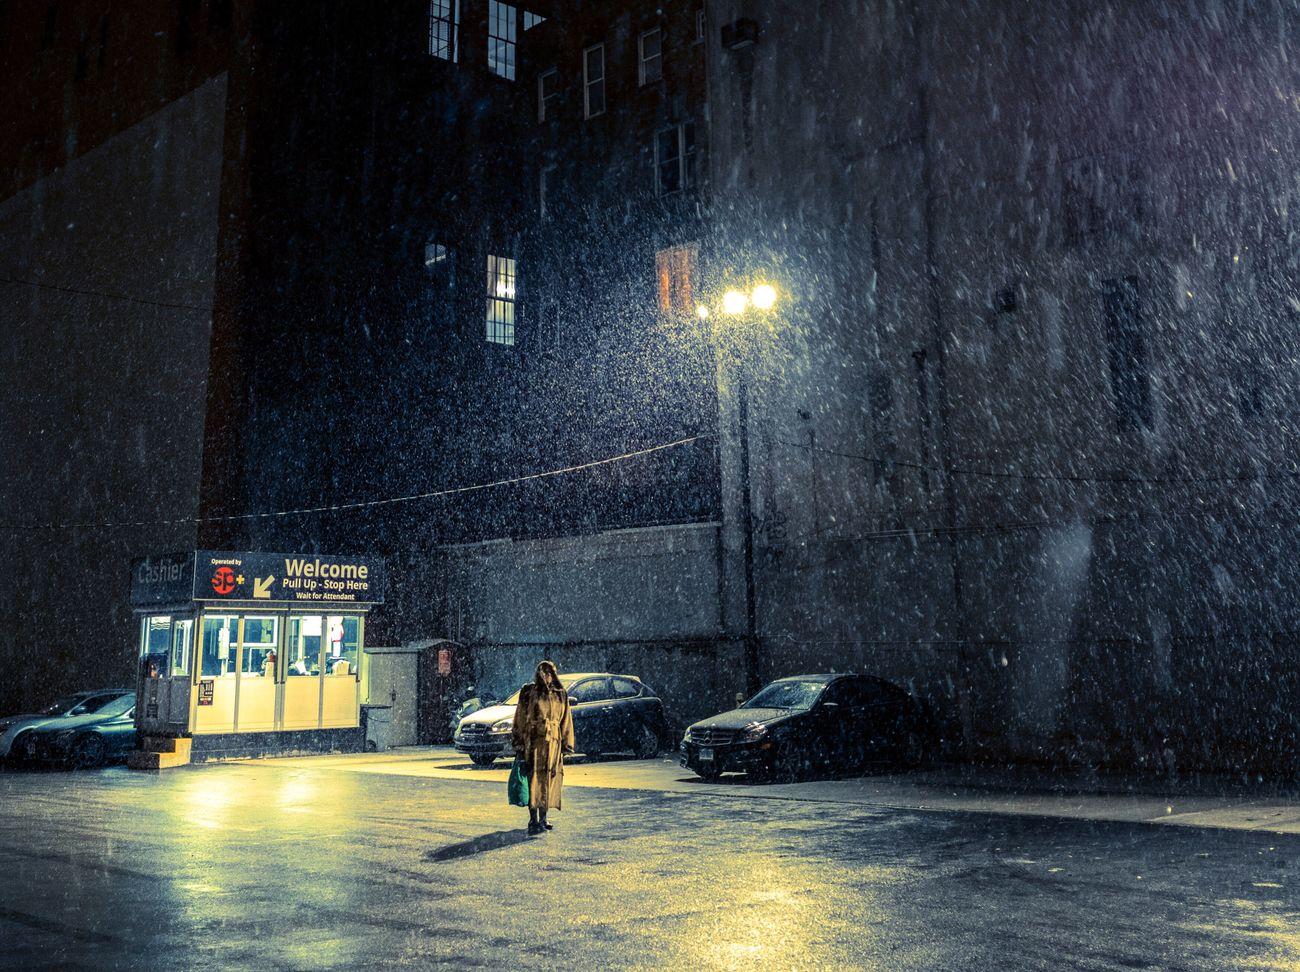 walking, real people, street, wet, men